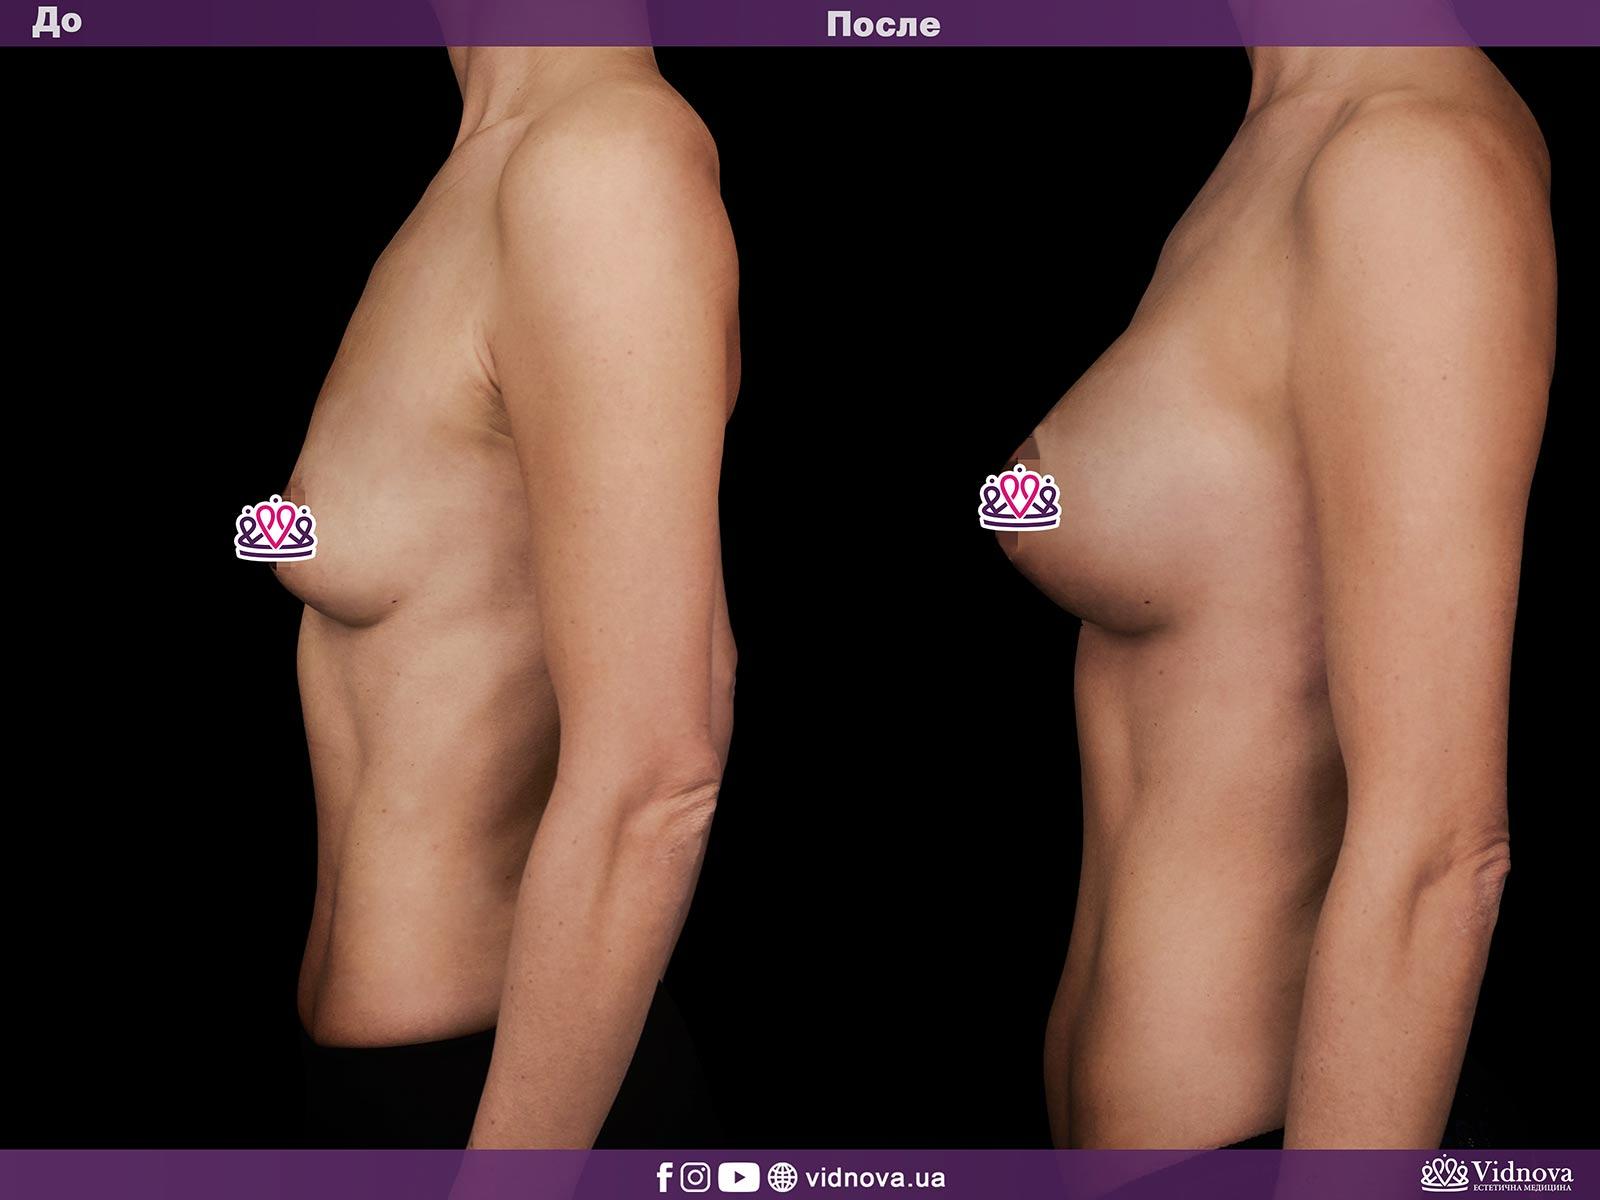 Увеличение груди: Фото ДО и ПОСЛЕ - Пример №17-3 - Клиника Vidnova